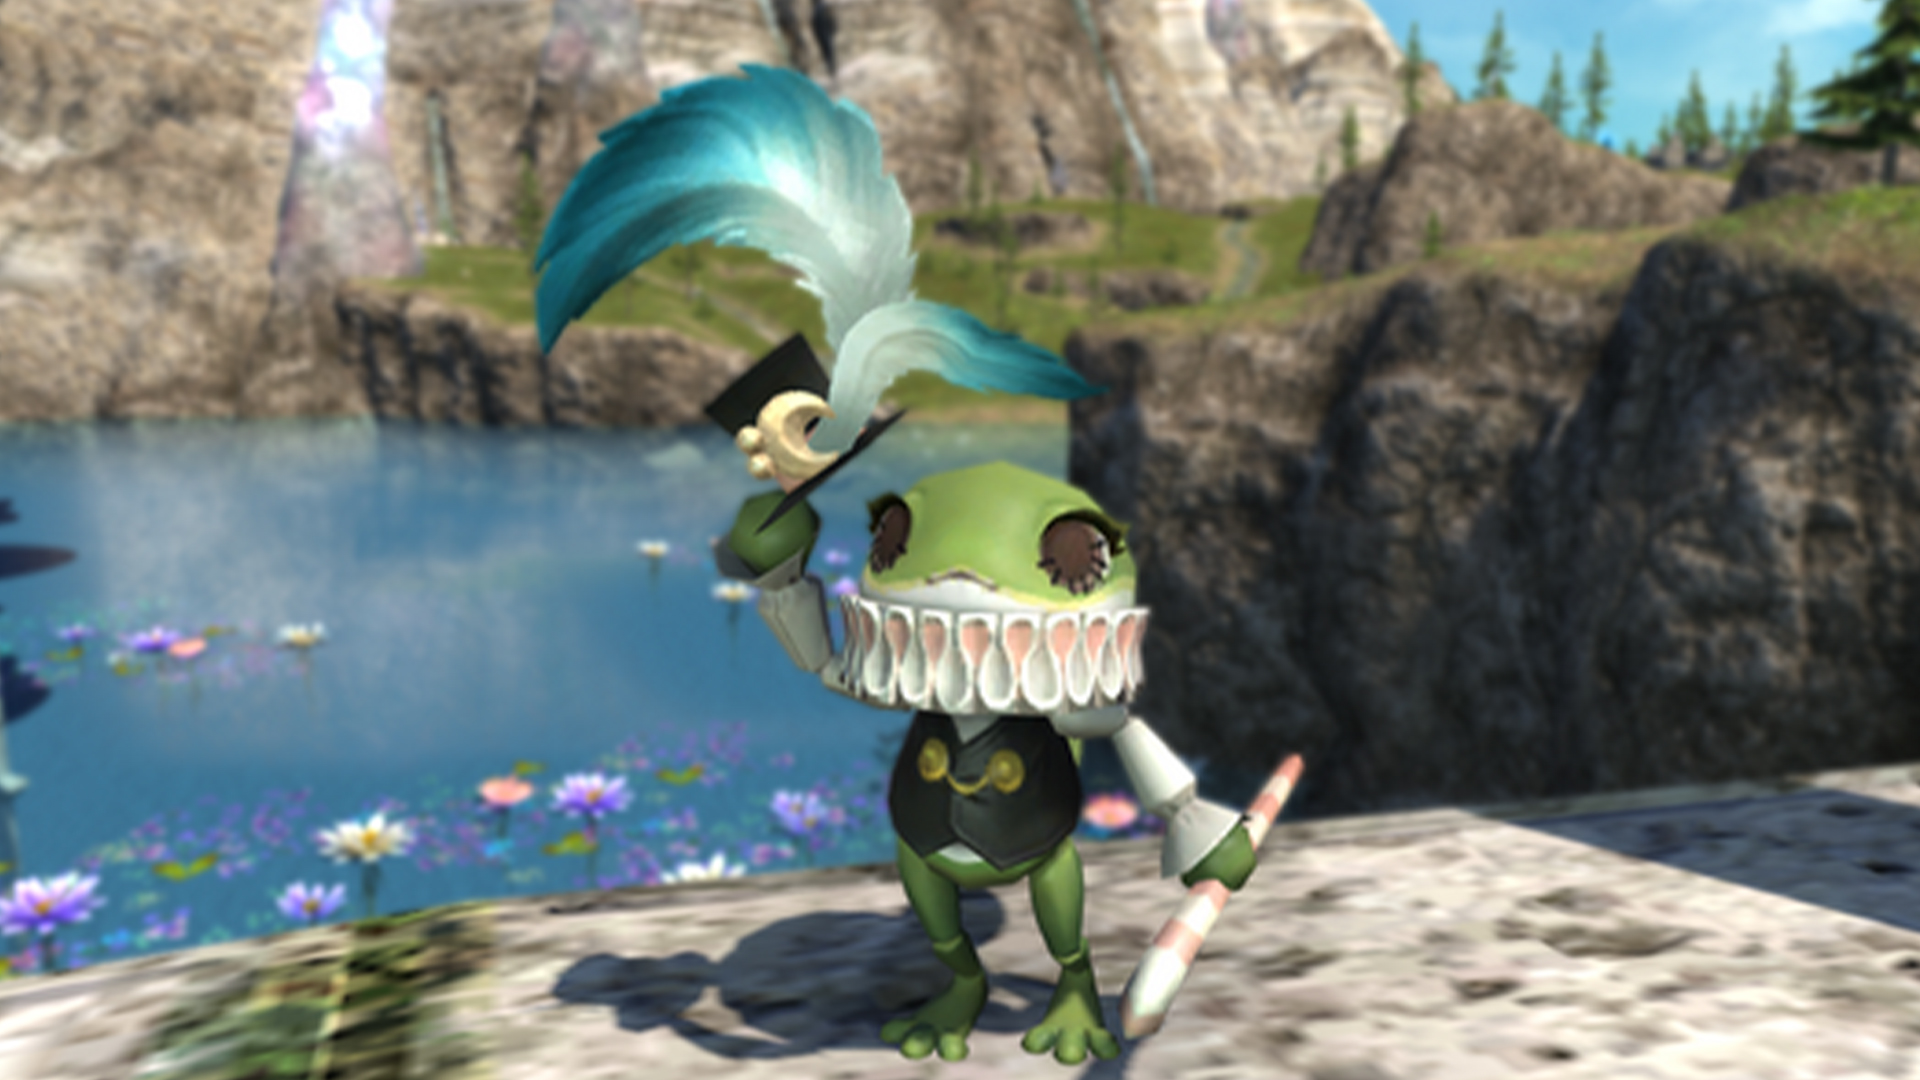 Final Fantasy XIV patch 5 05 buffs Monk, Samurai, and